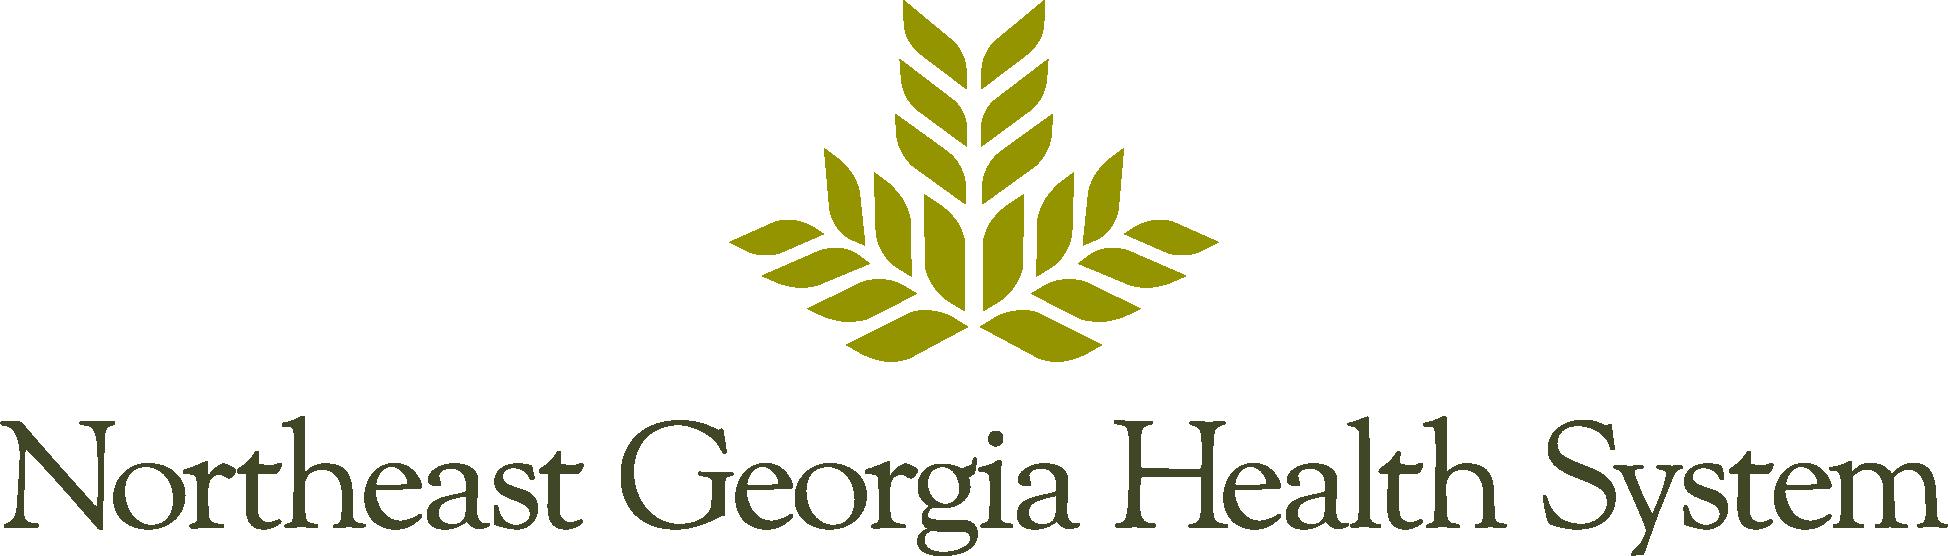 NGHS_logo_reg-1